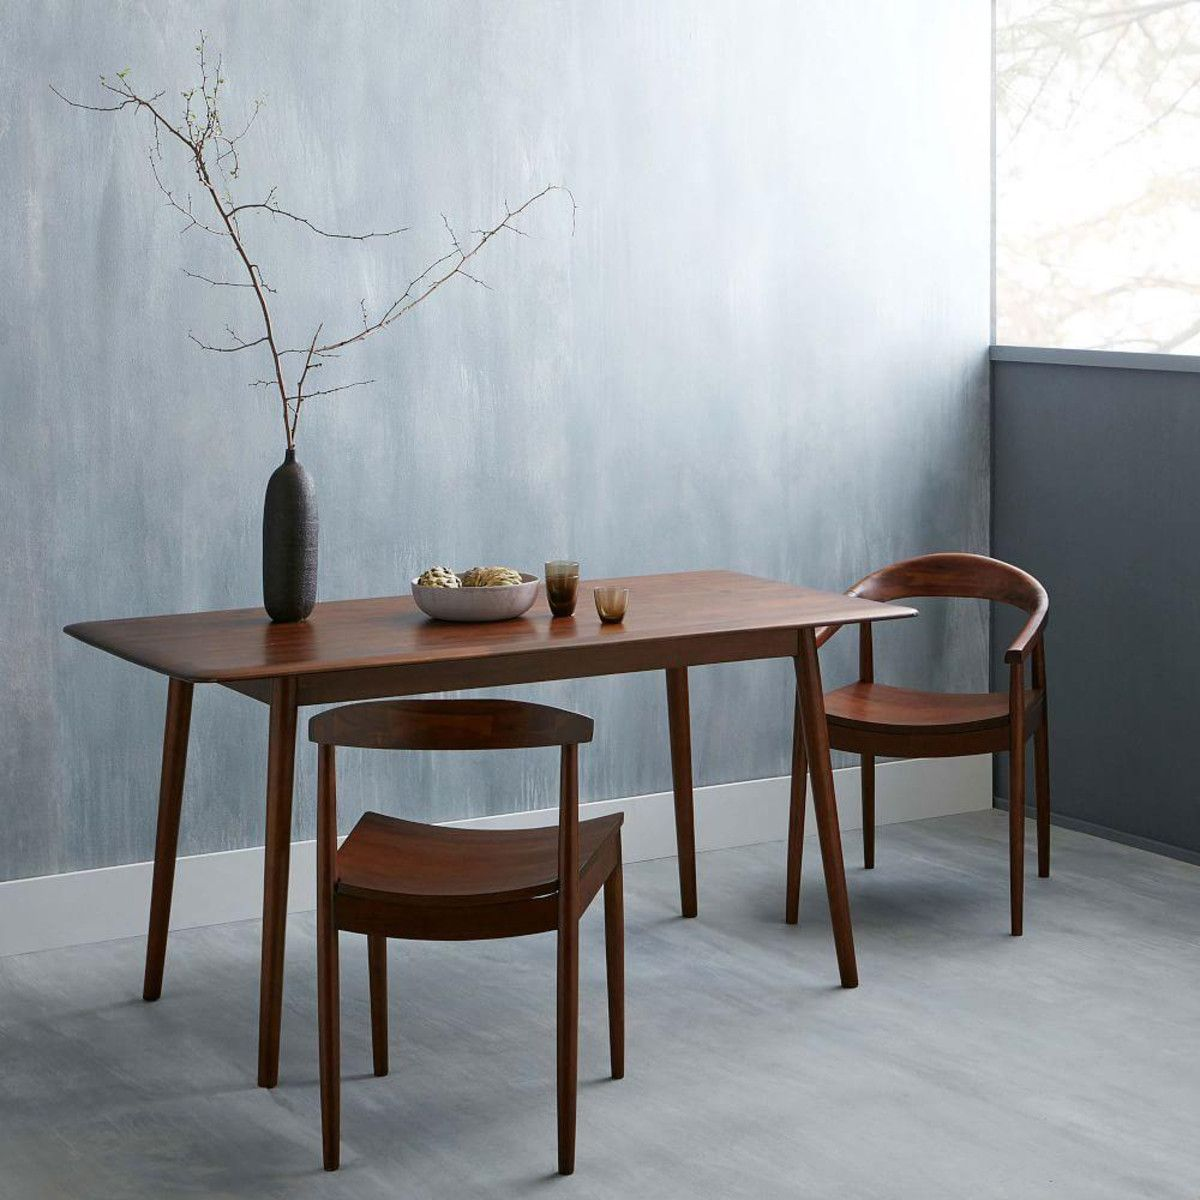 Lena Mid-Century Dining Table | Mid century dining table, Mid ...